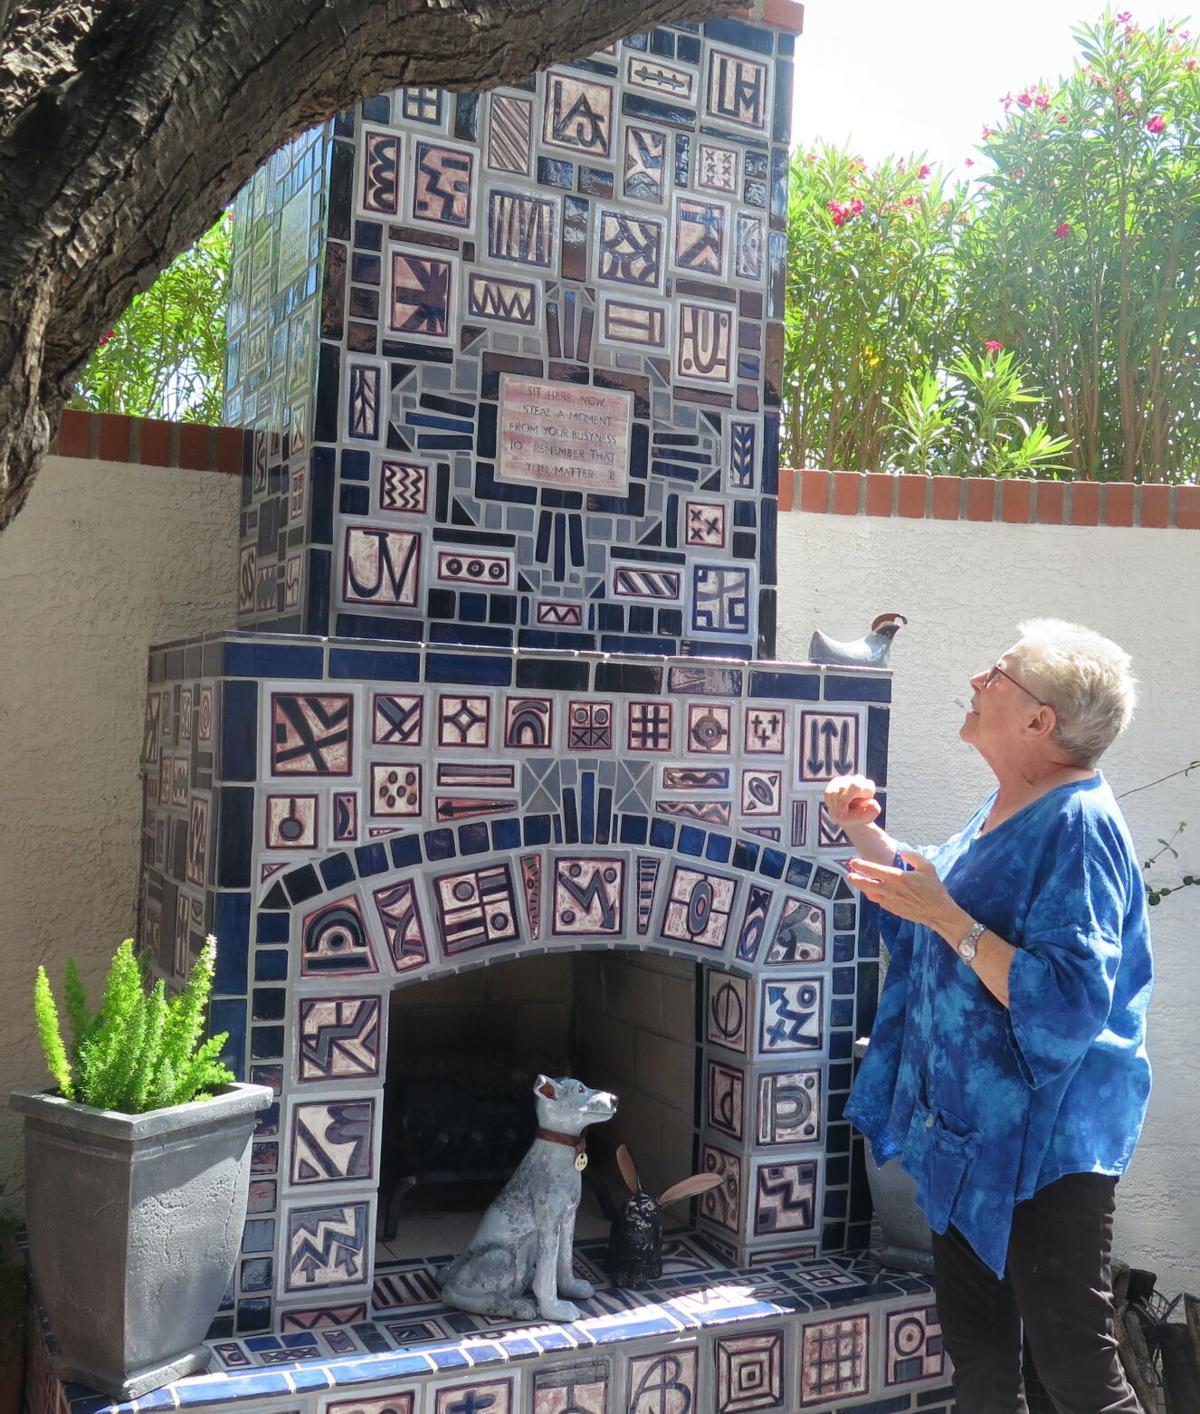 ONE-OF-A-KIND WONDER: Outdoor fireplace a true work of art